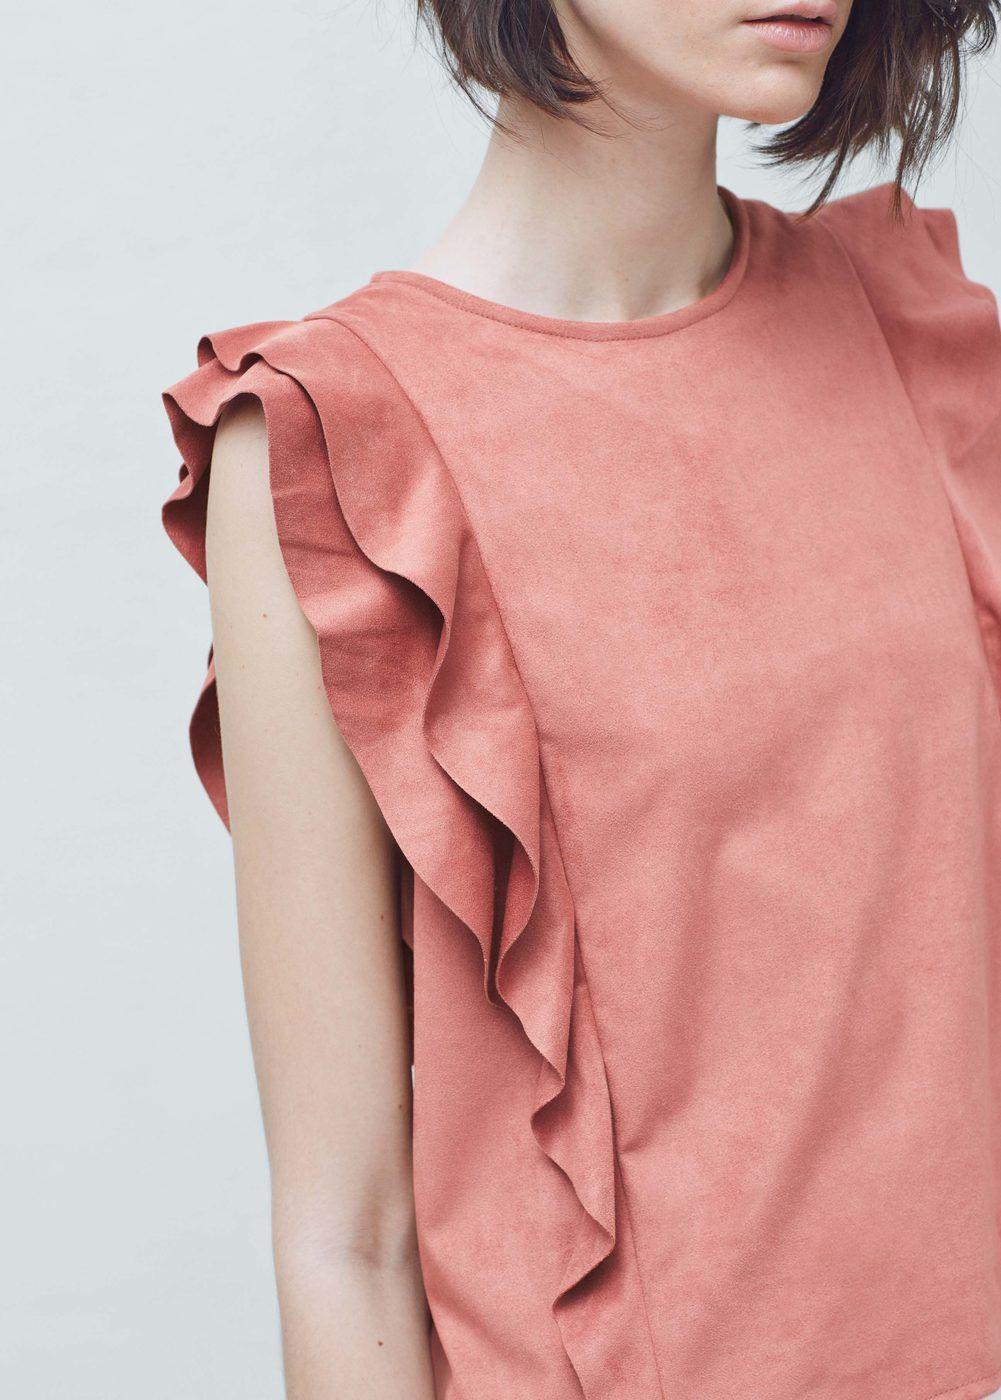 Ruffled top | MANGO For similar items, please visit http://www.fashioncraycray.xyz/